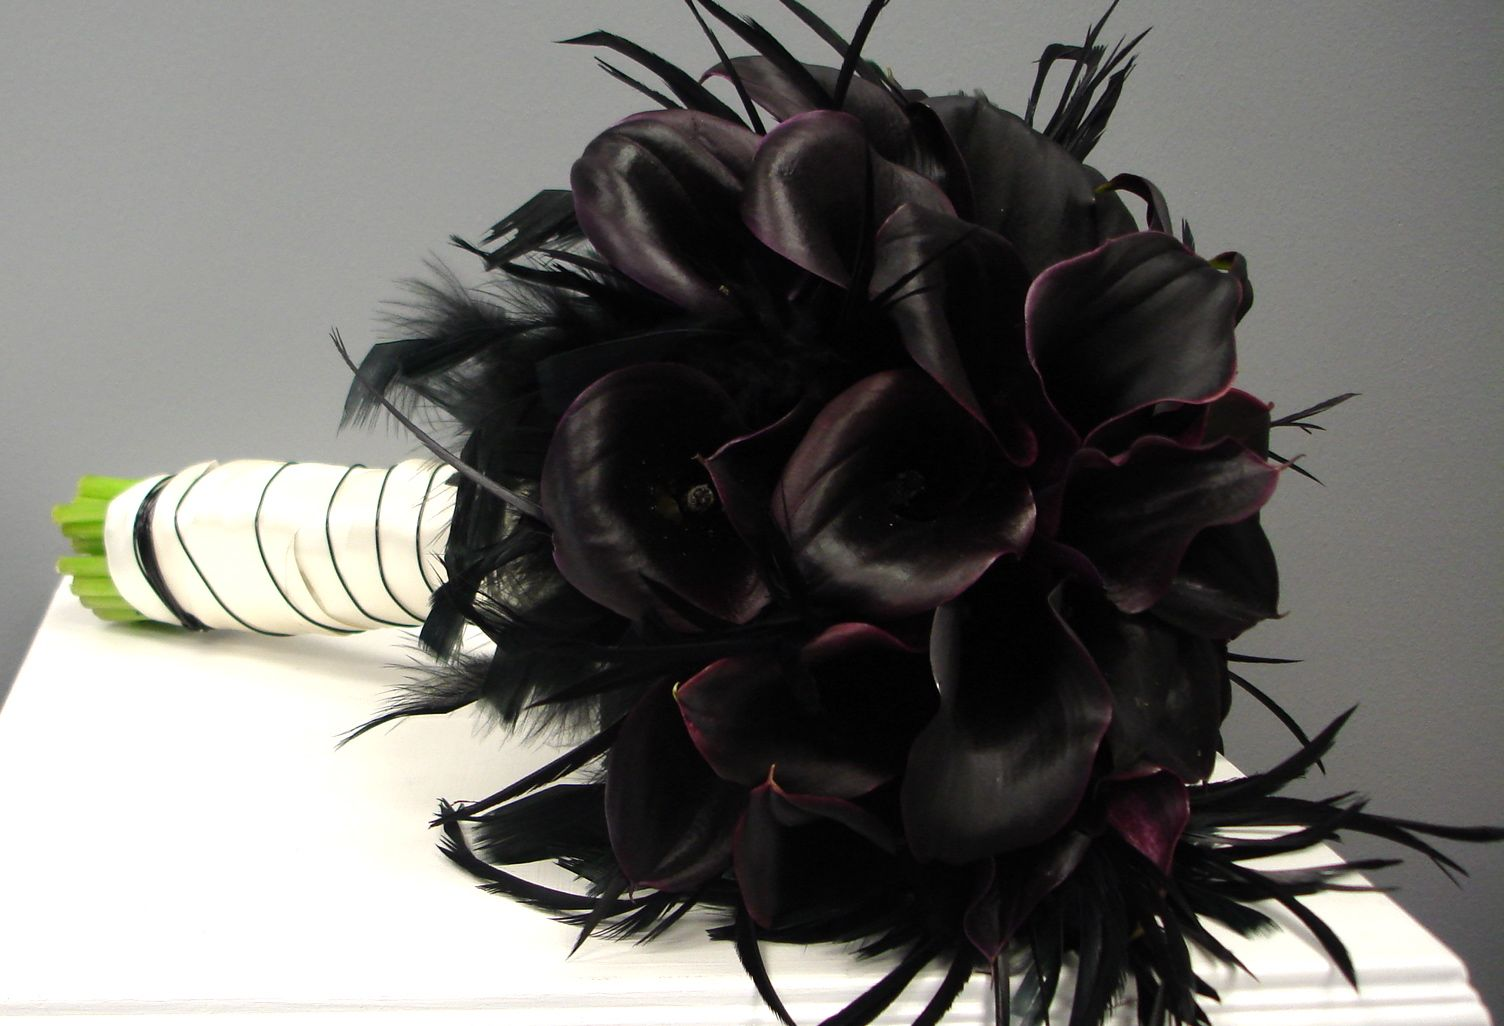 Black flowers for wedding bouquet 20 background hdflowerwallpaper black flowers for wedding bouquet wide wallpaper izmirmasajfo